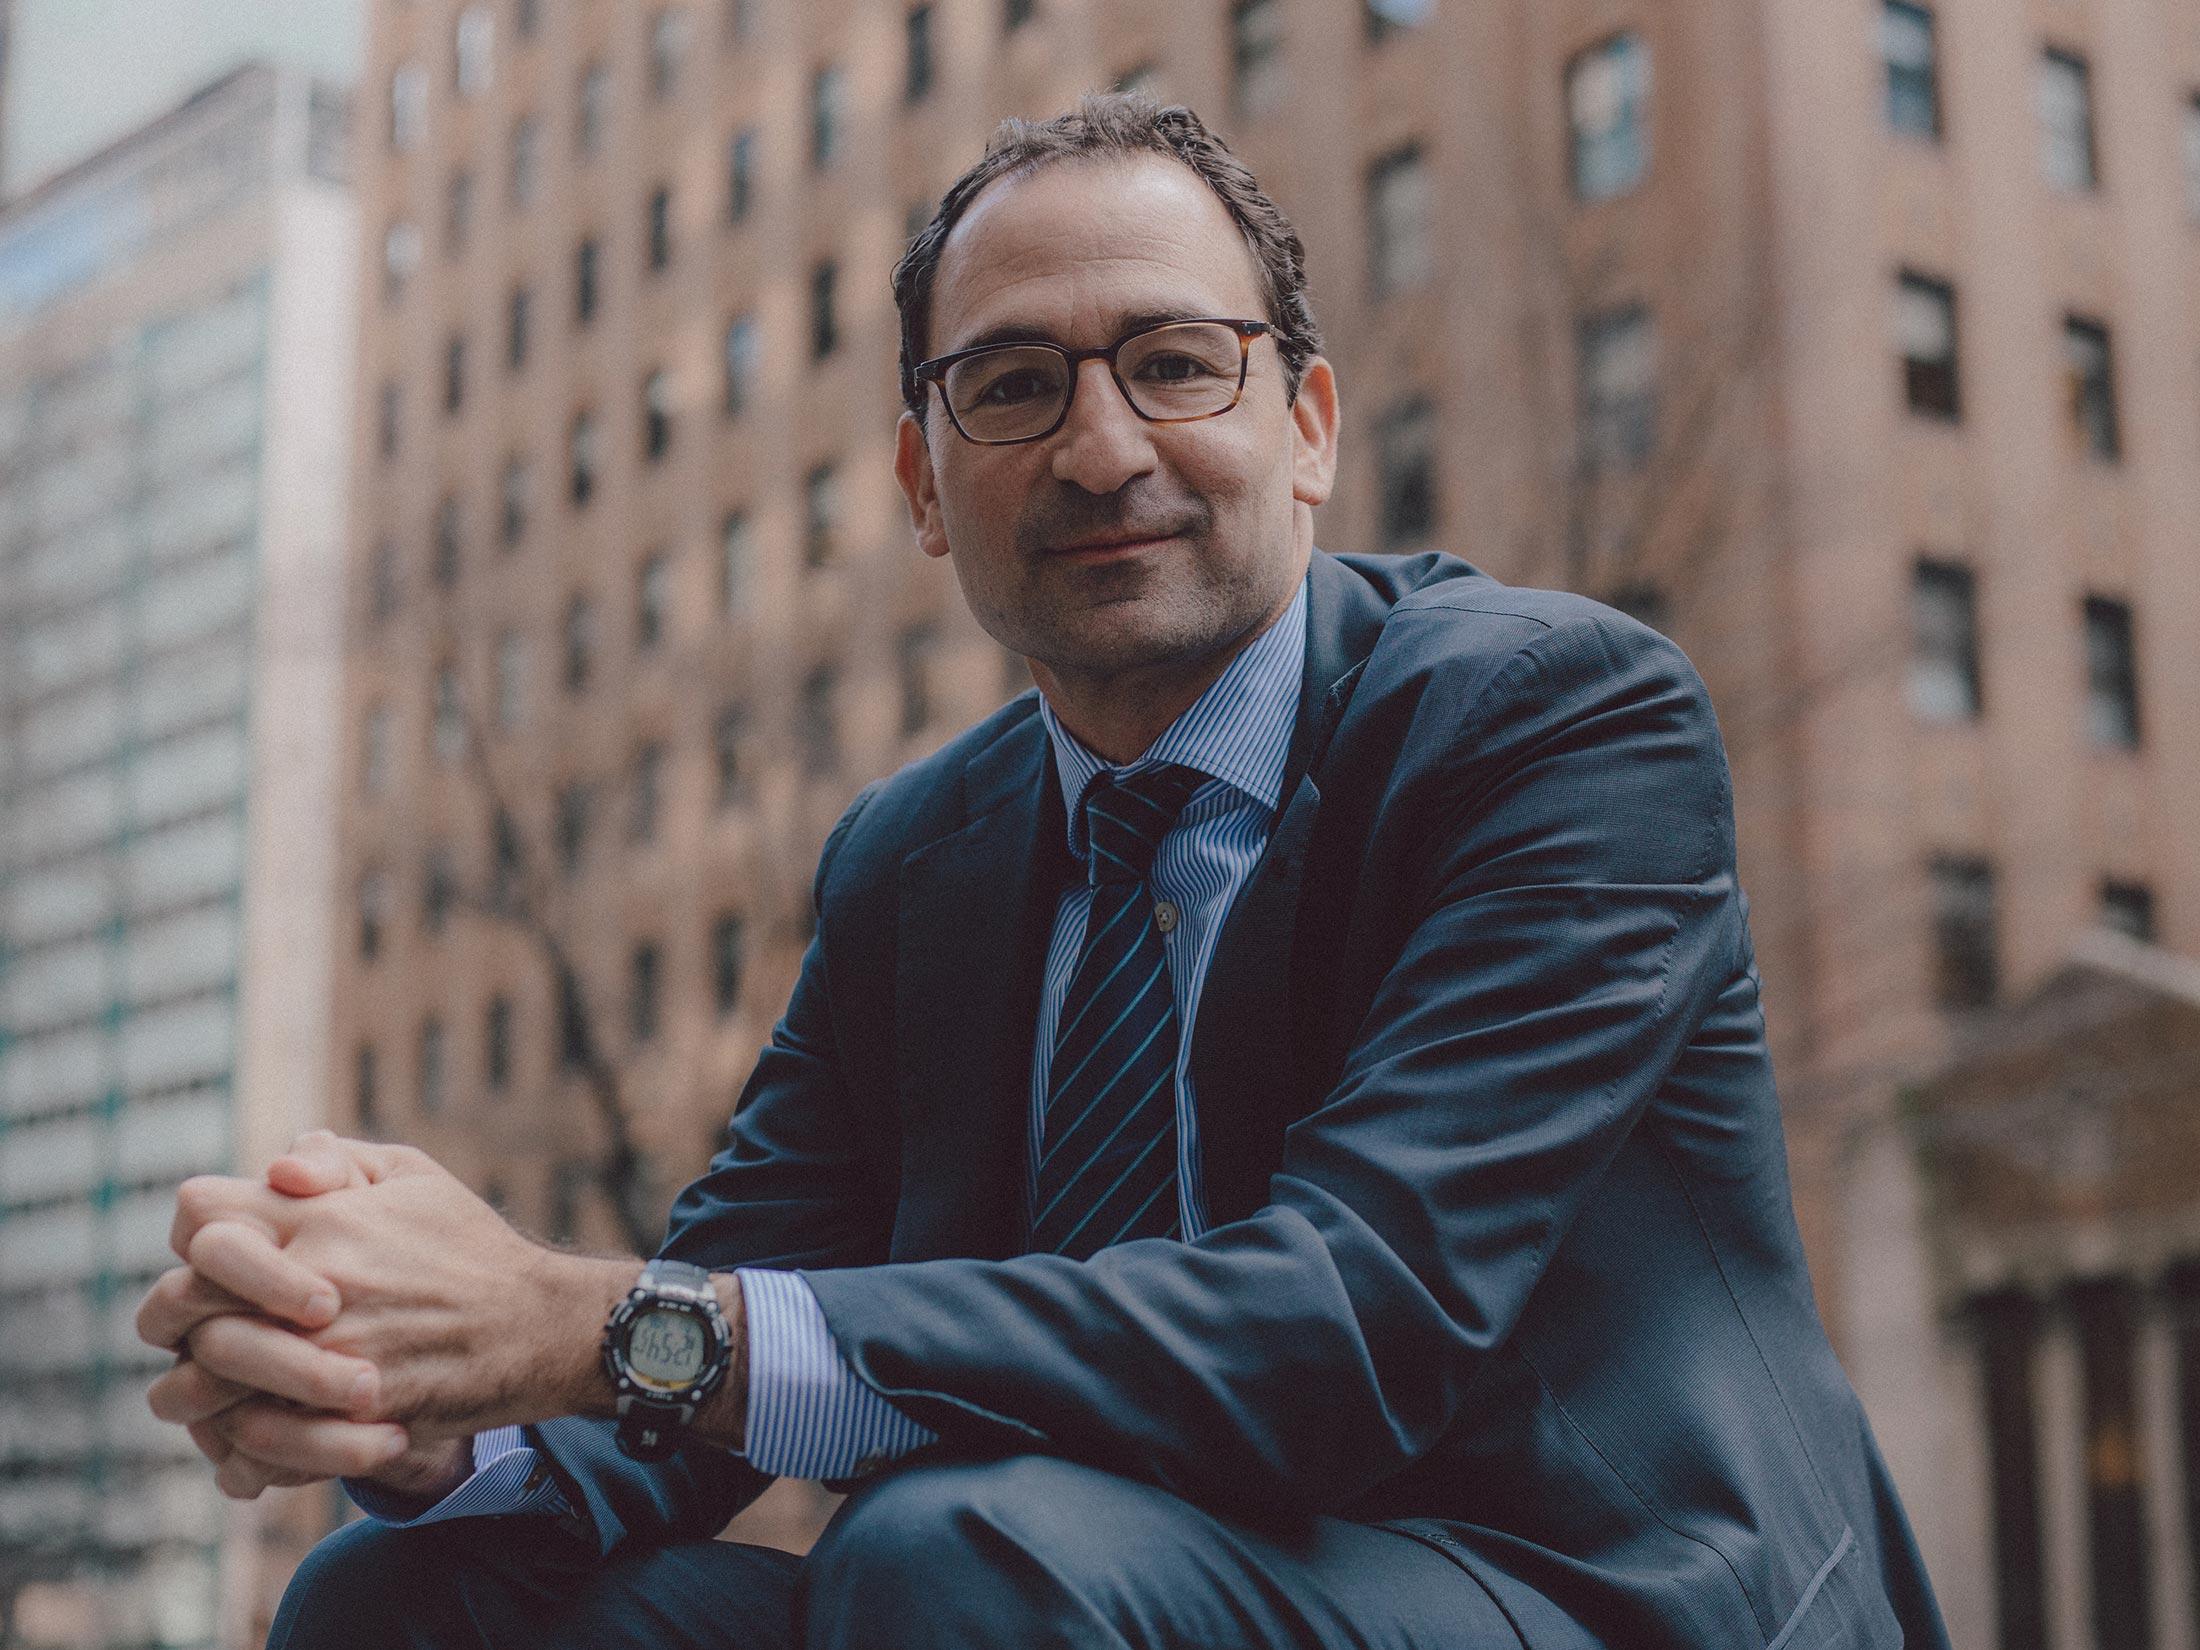 bloomberg.com - Jason Kelly - Blackstone President and COO Jonathan Gray Sees Volatility Ahead